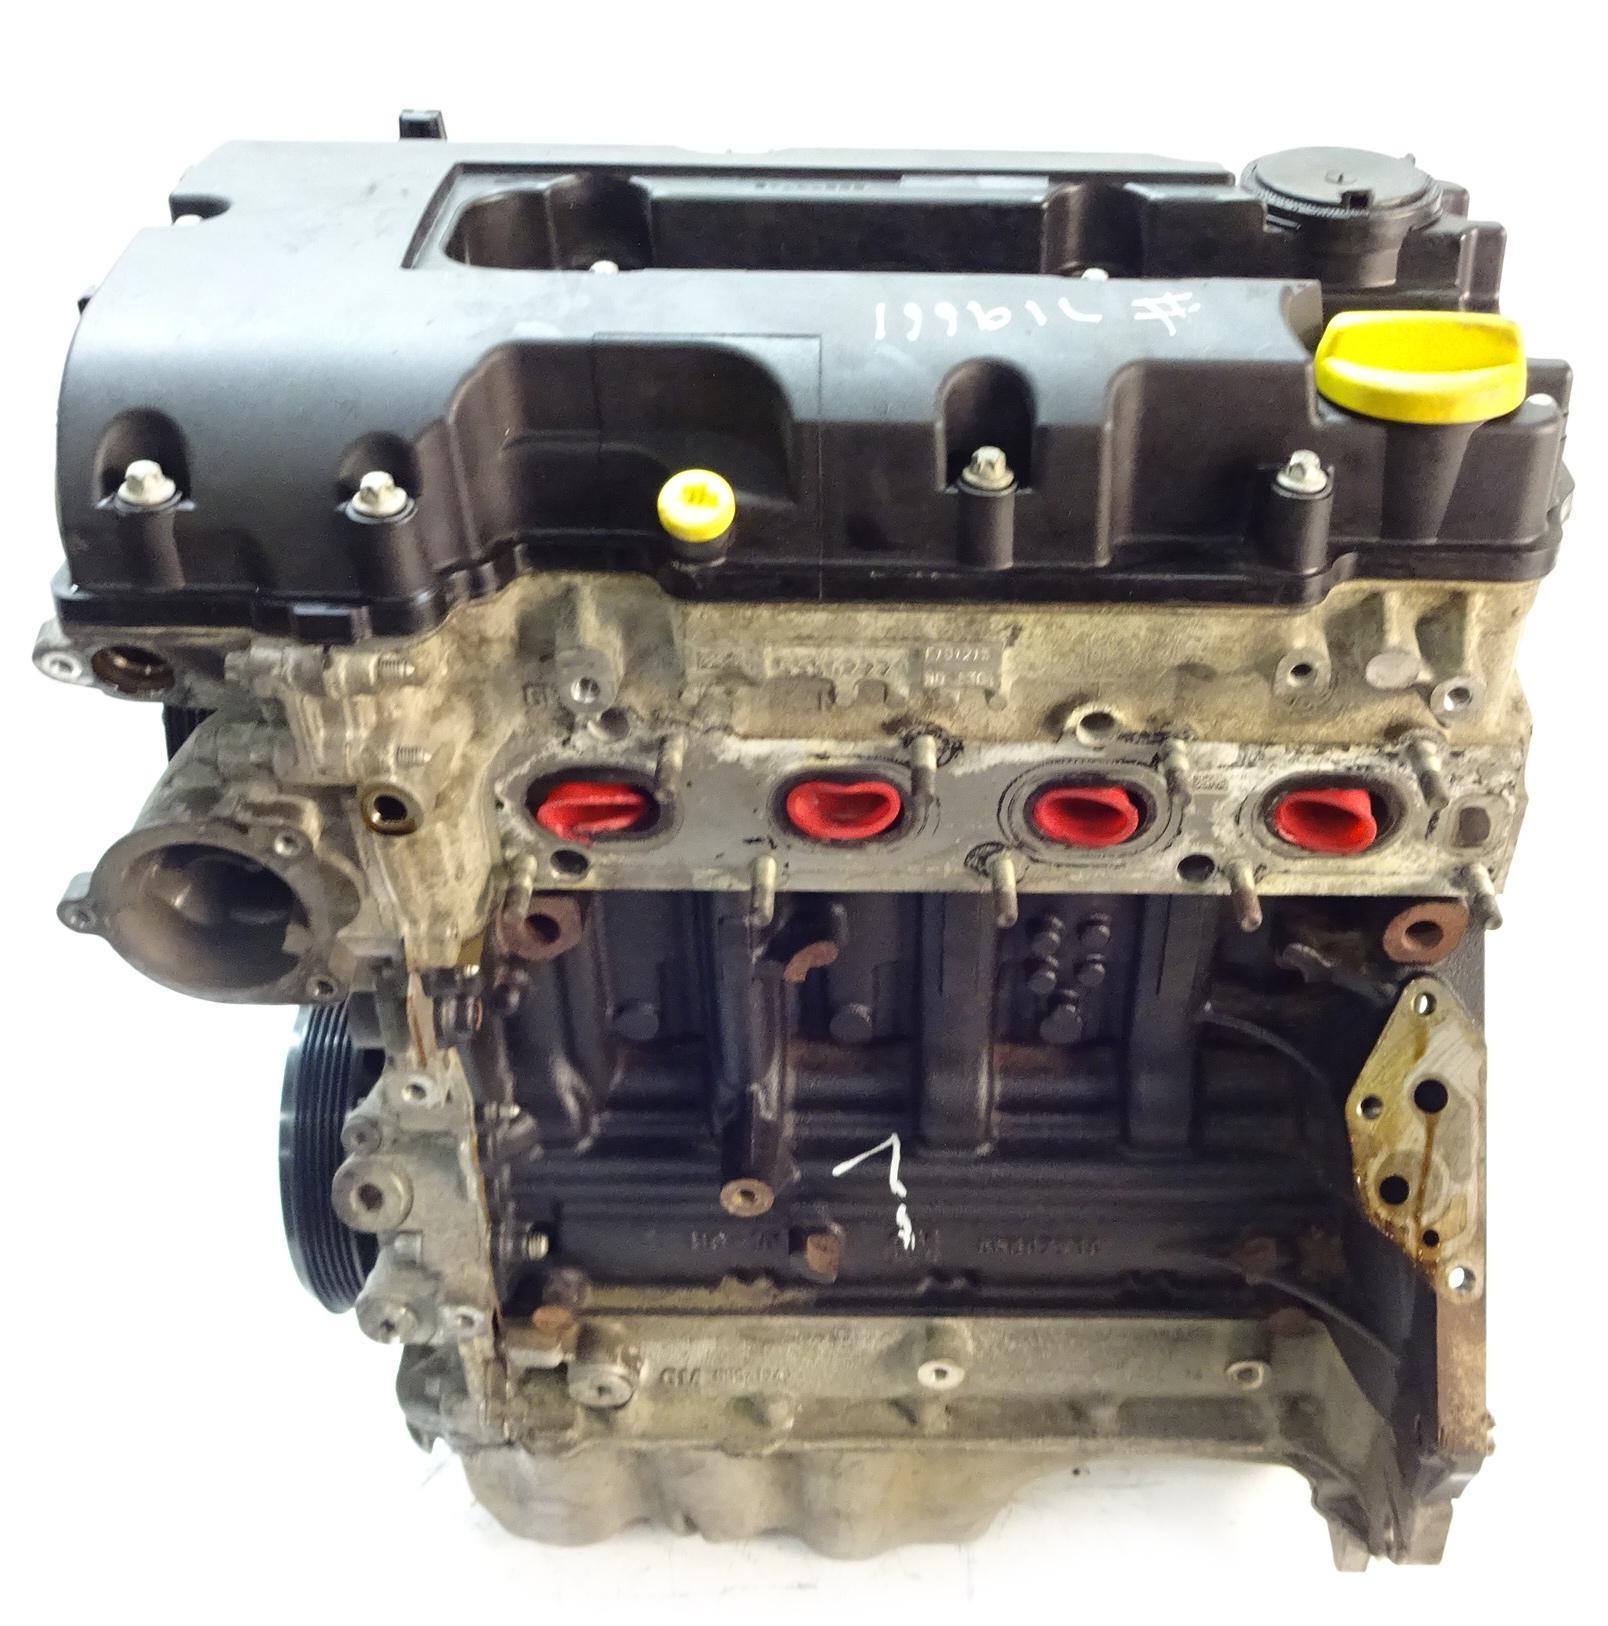 Motor 2012 Opel Astra J Meriva B Adam 1,4 Benzin B14 B14XER